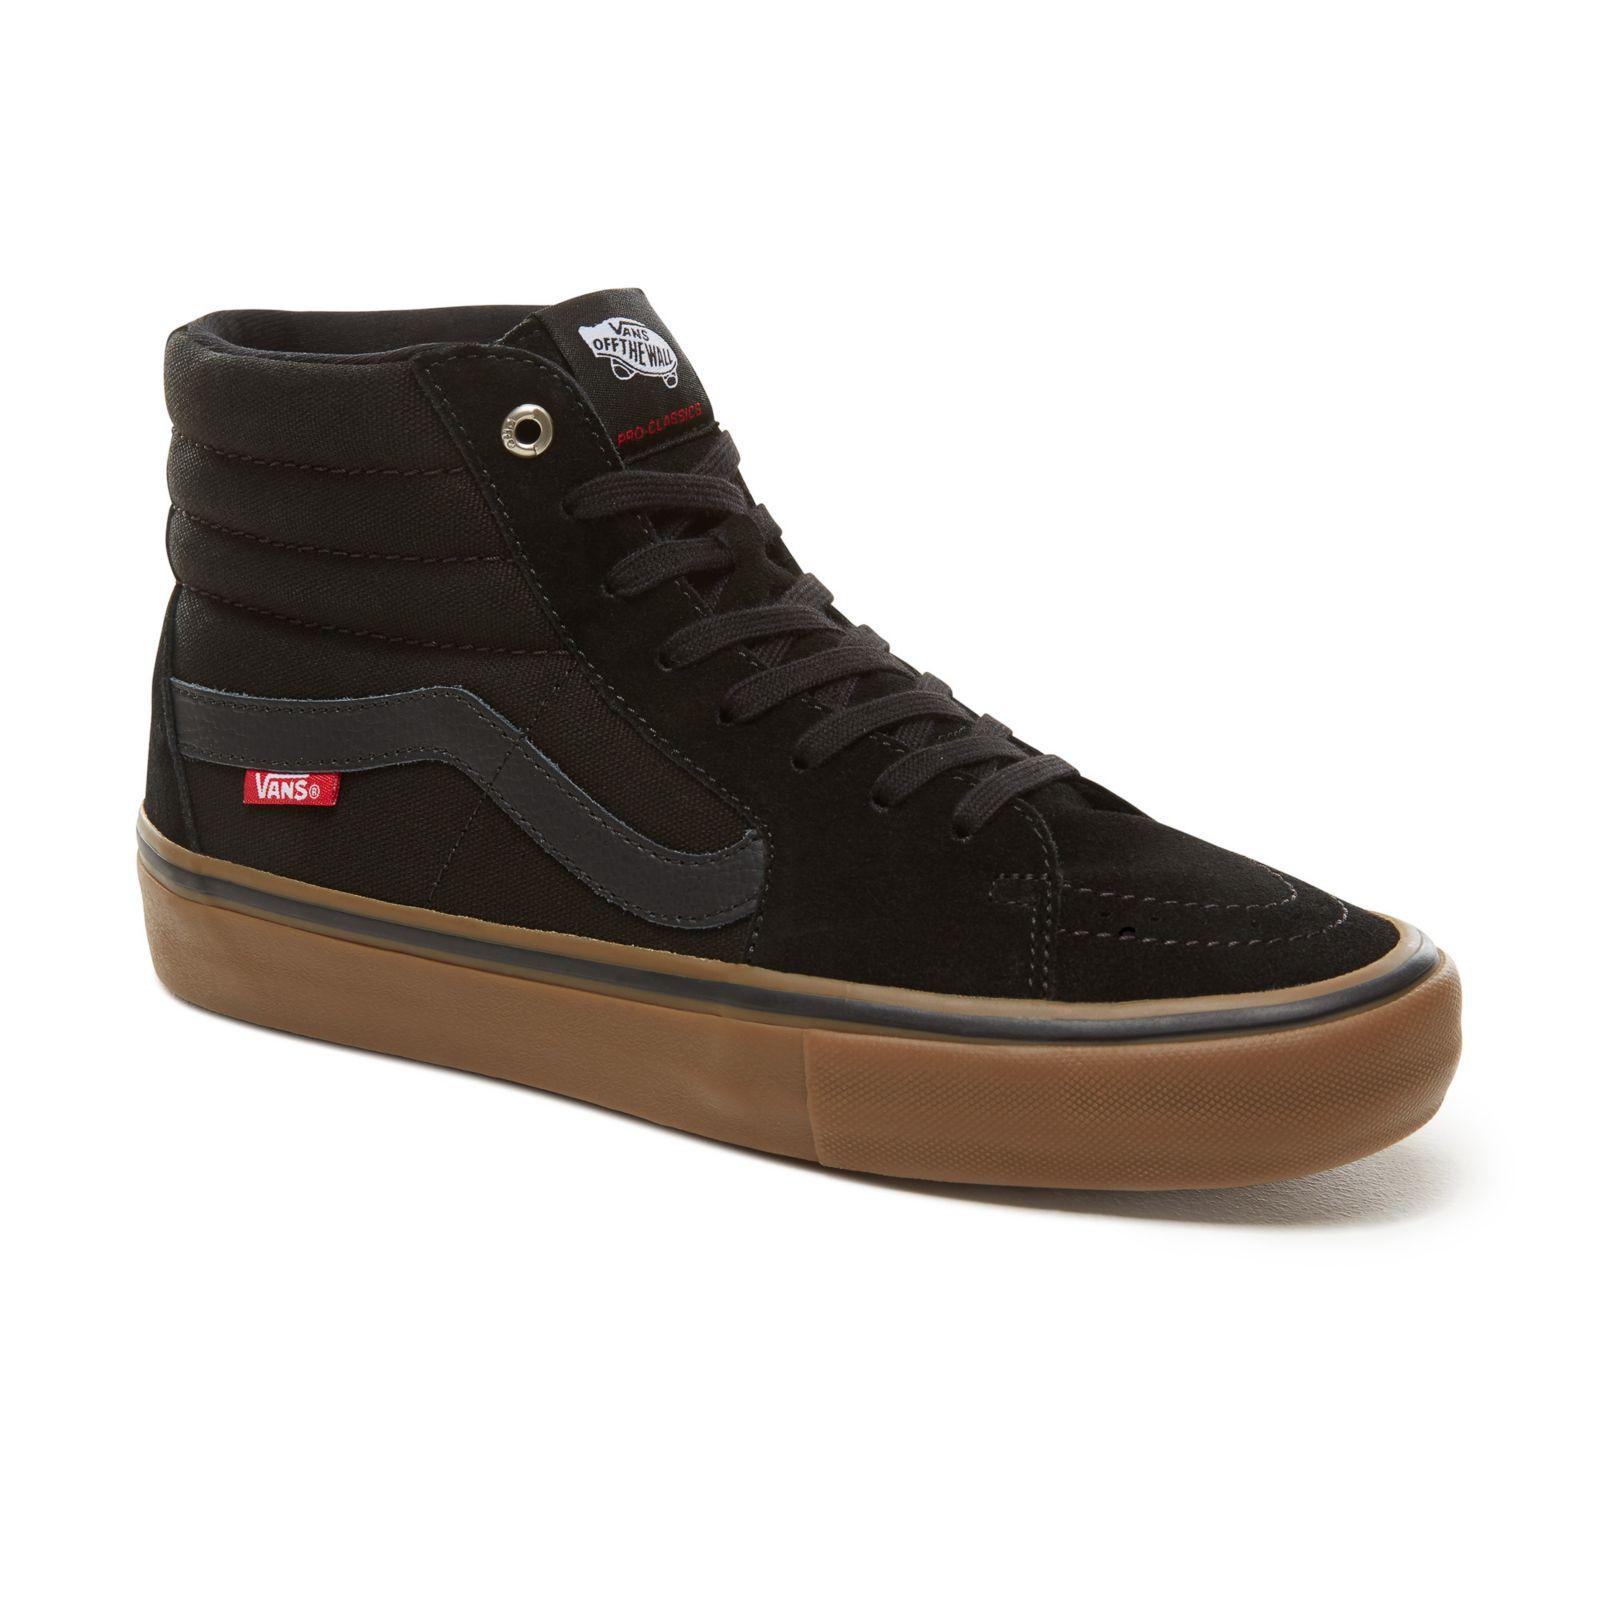 Sneakers Vans Sk8-Hi Pro black/gum